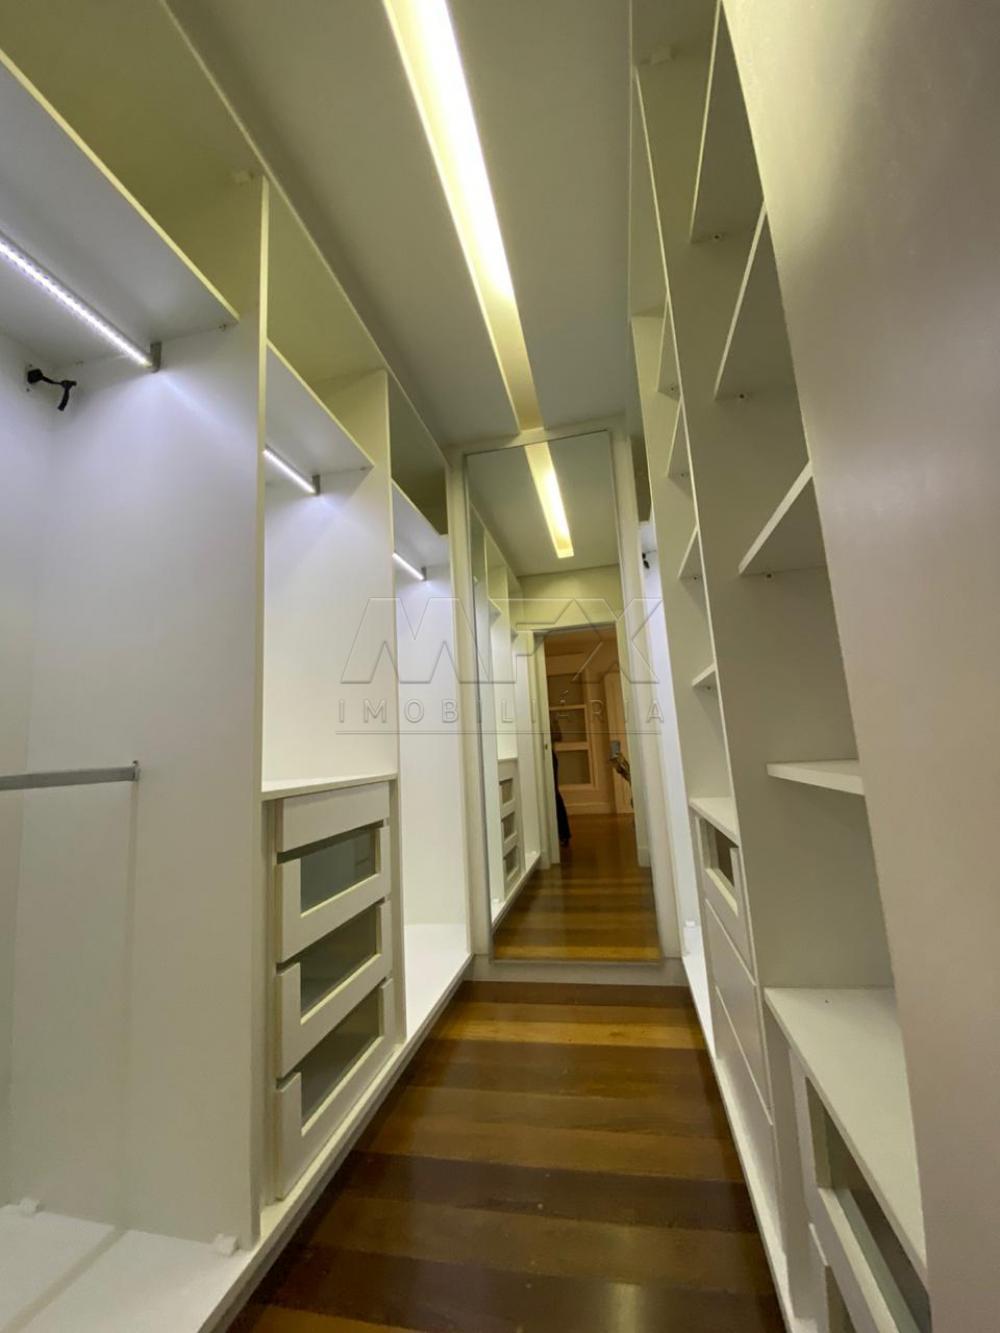 Comprar Casa / Condomínio em Bauru apenas R$ 2.000.000,00 - Foto 20